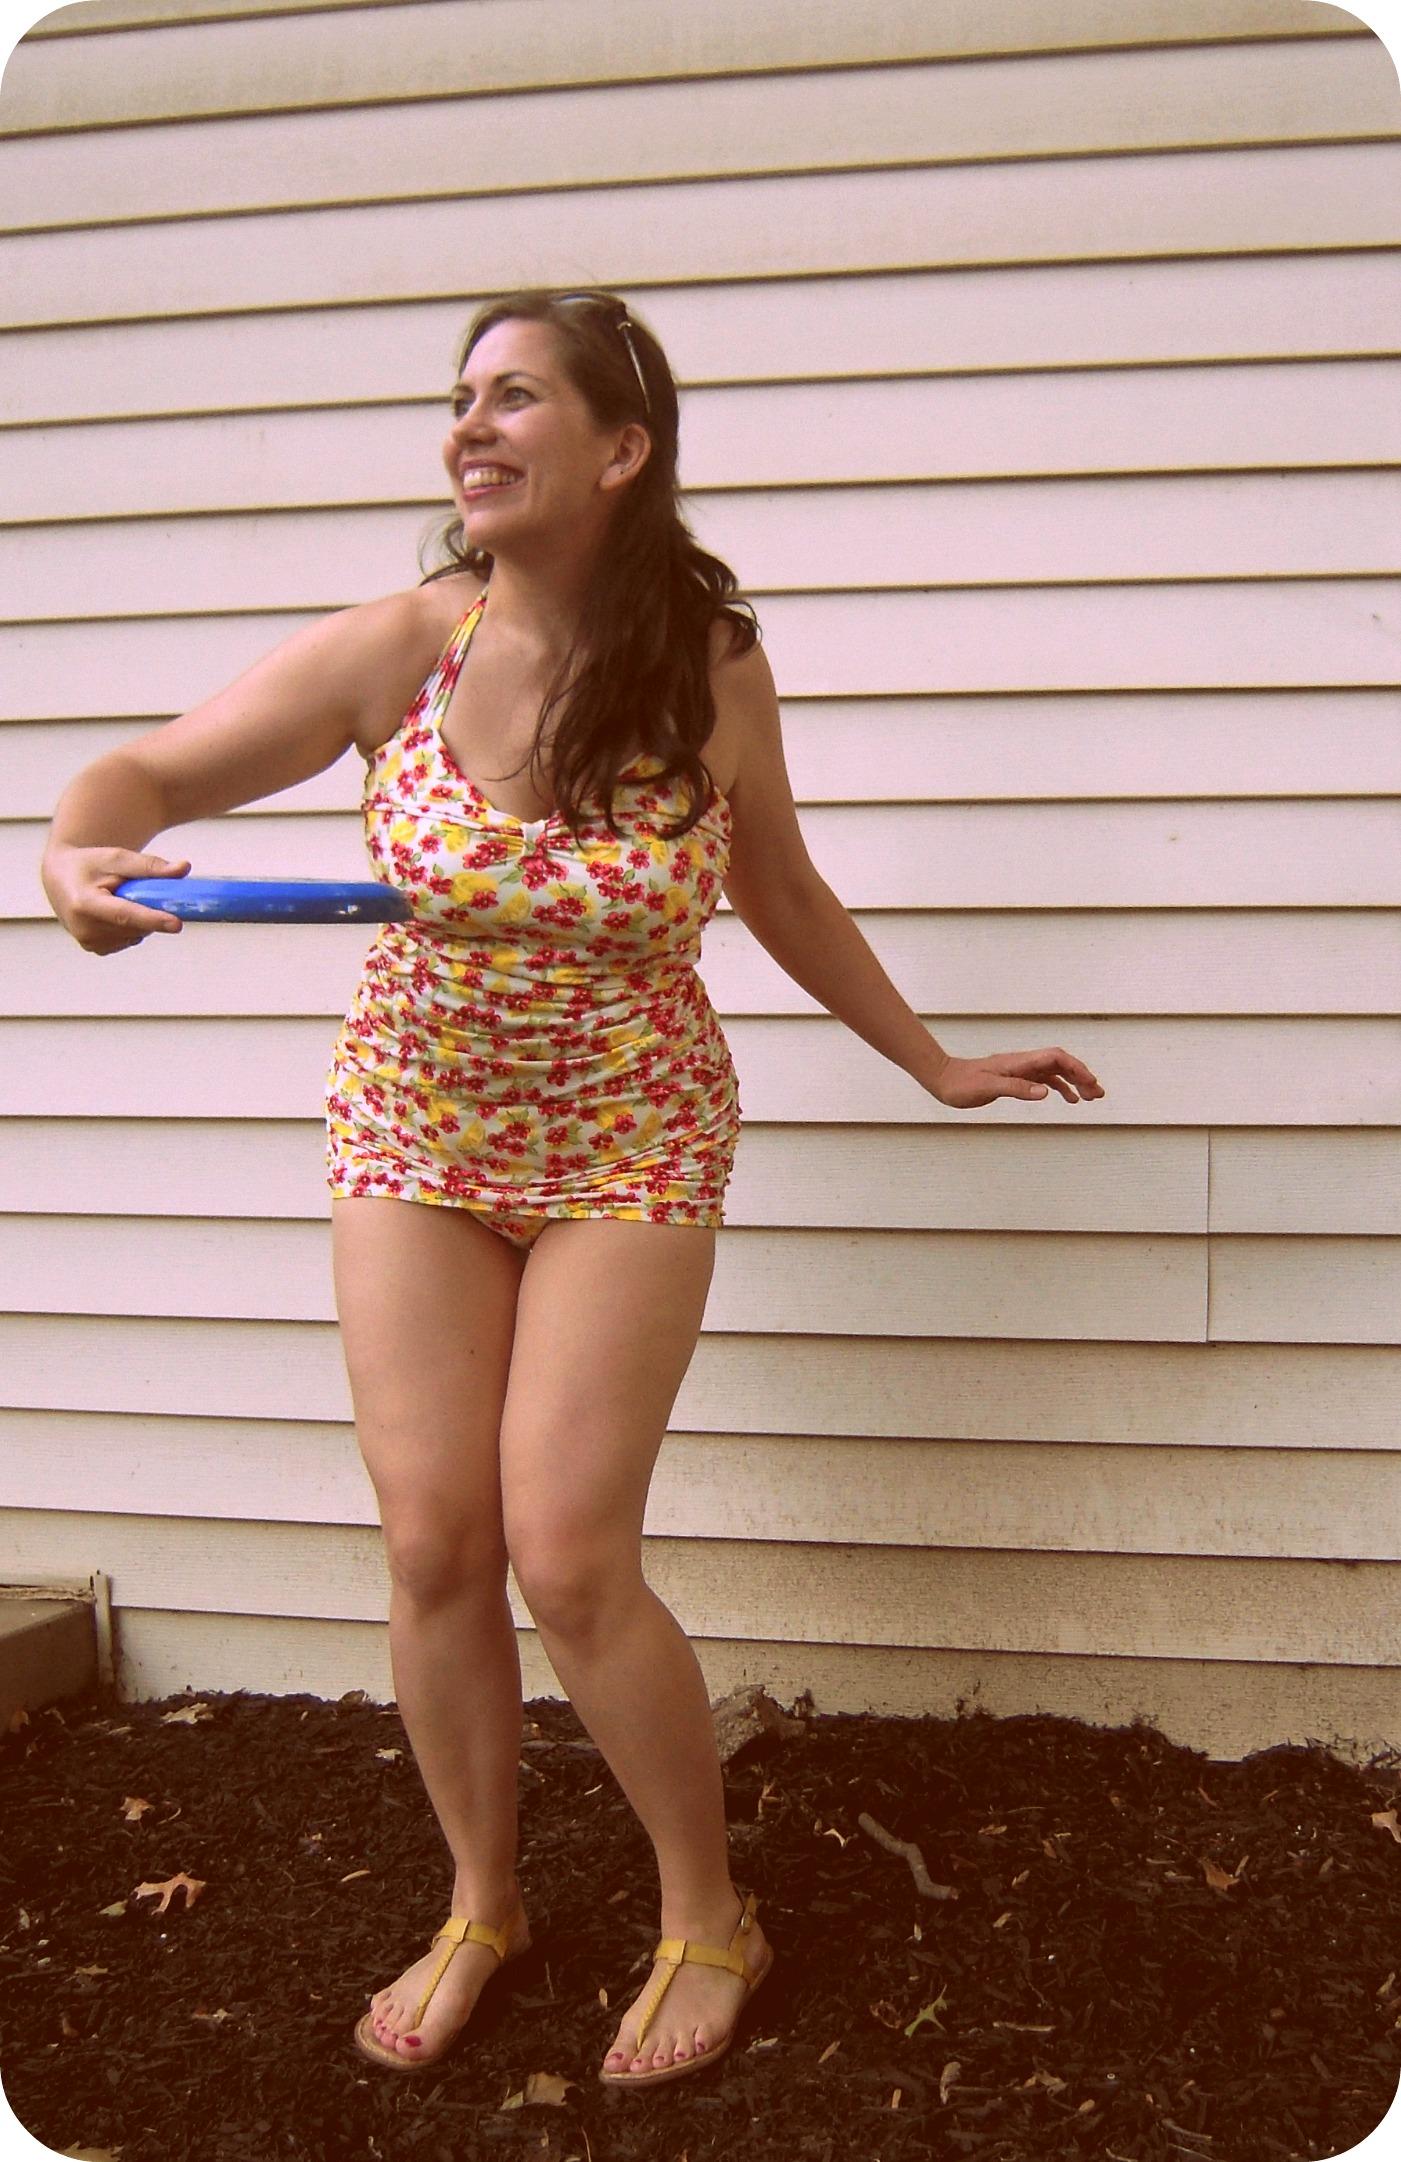 70b7f751f1ff8 Closet Case Files Bombshell Swimsuit – Three Dresses   LMB